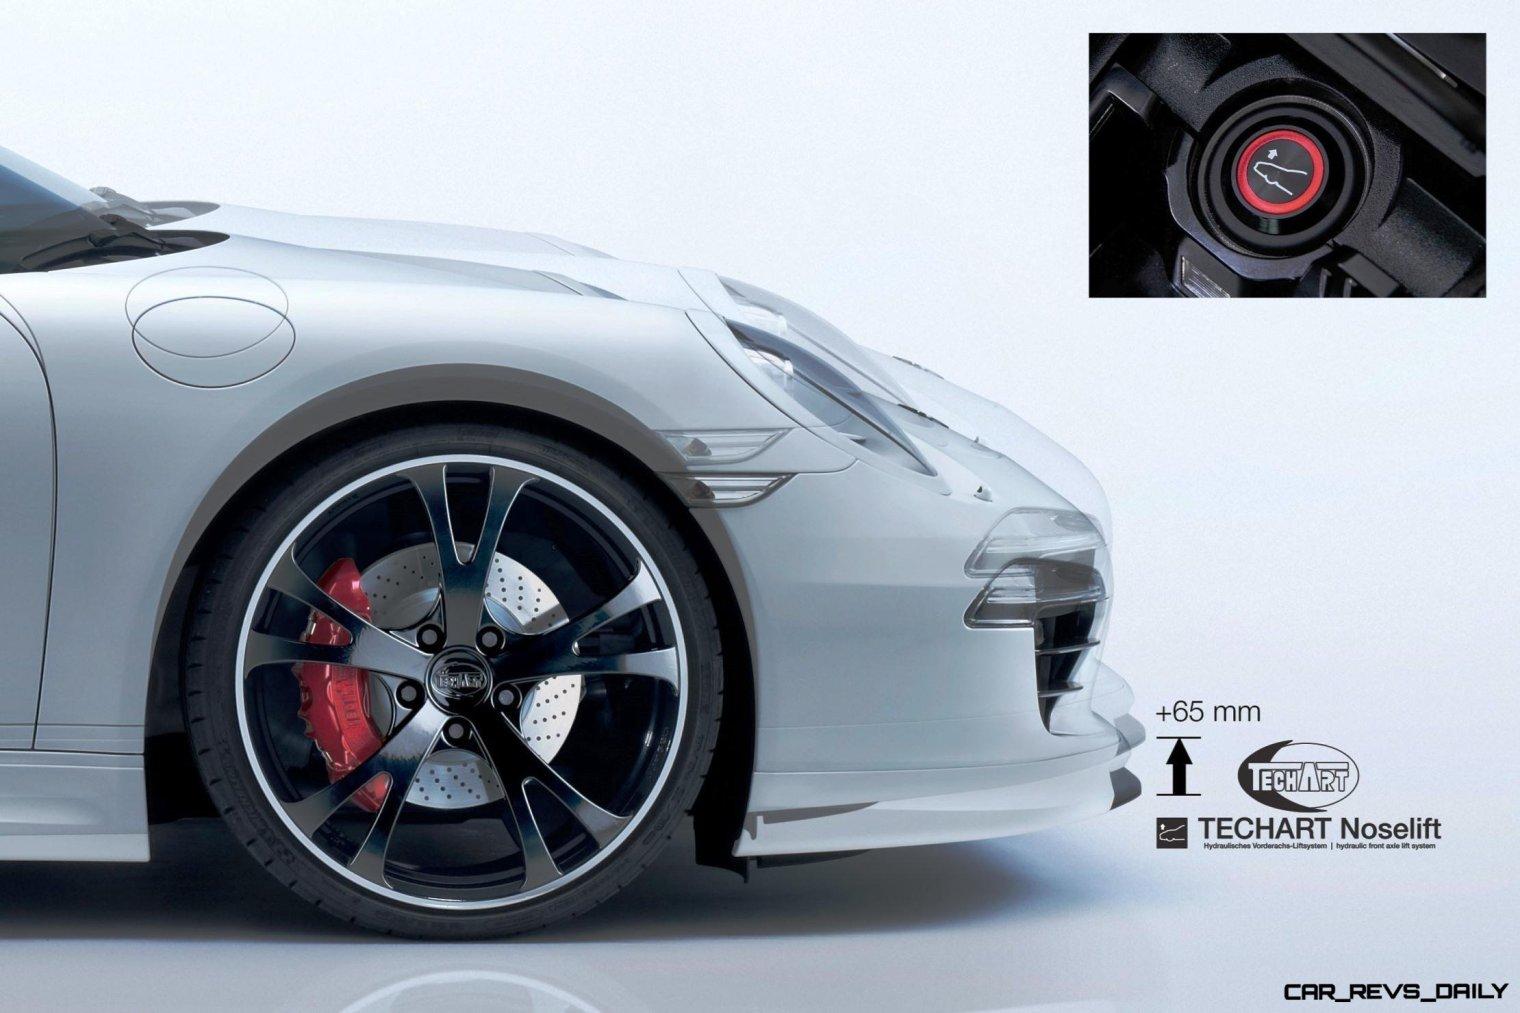 TECHART_Noselift_System_for_Porsche_911_models